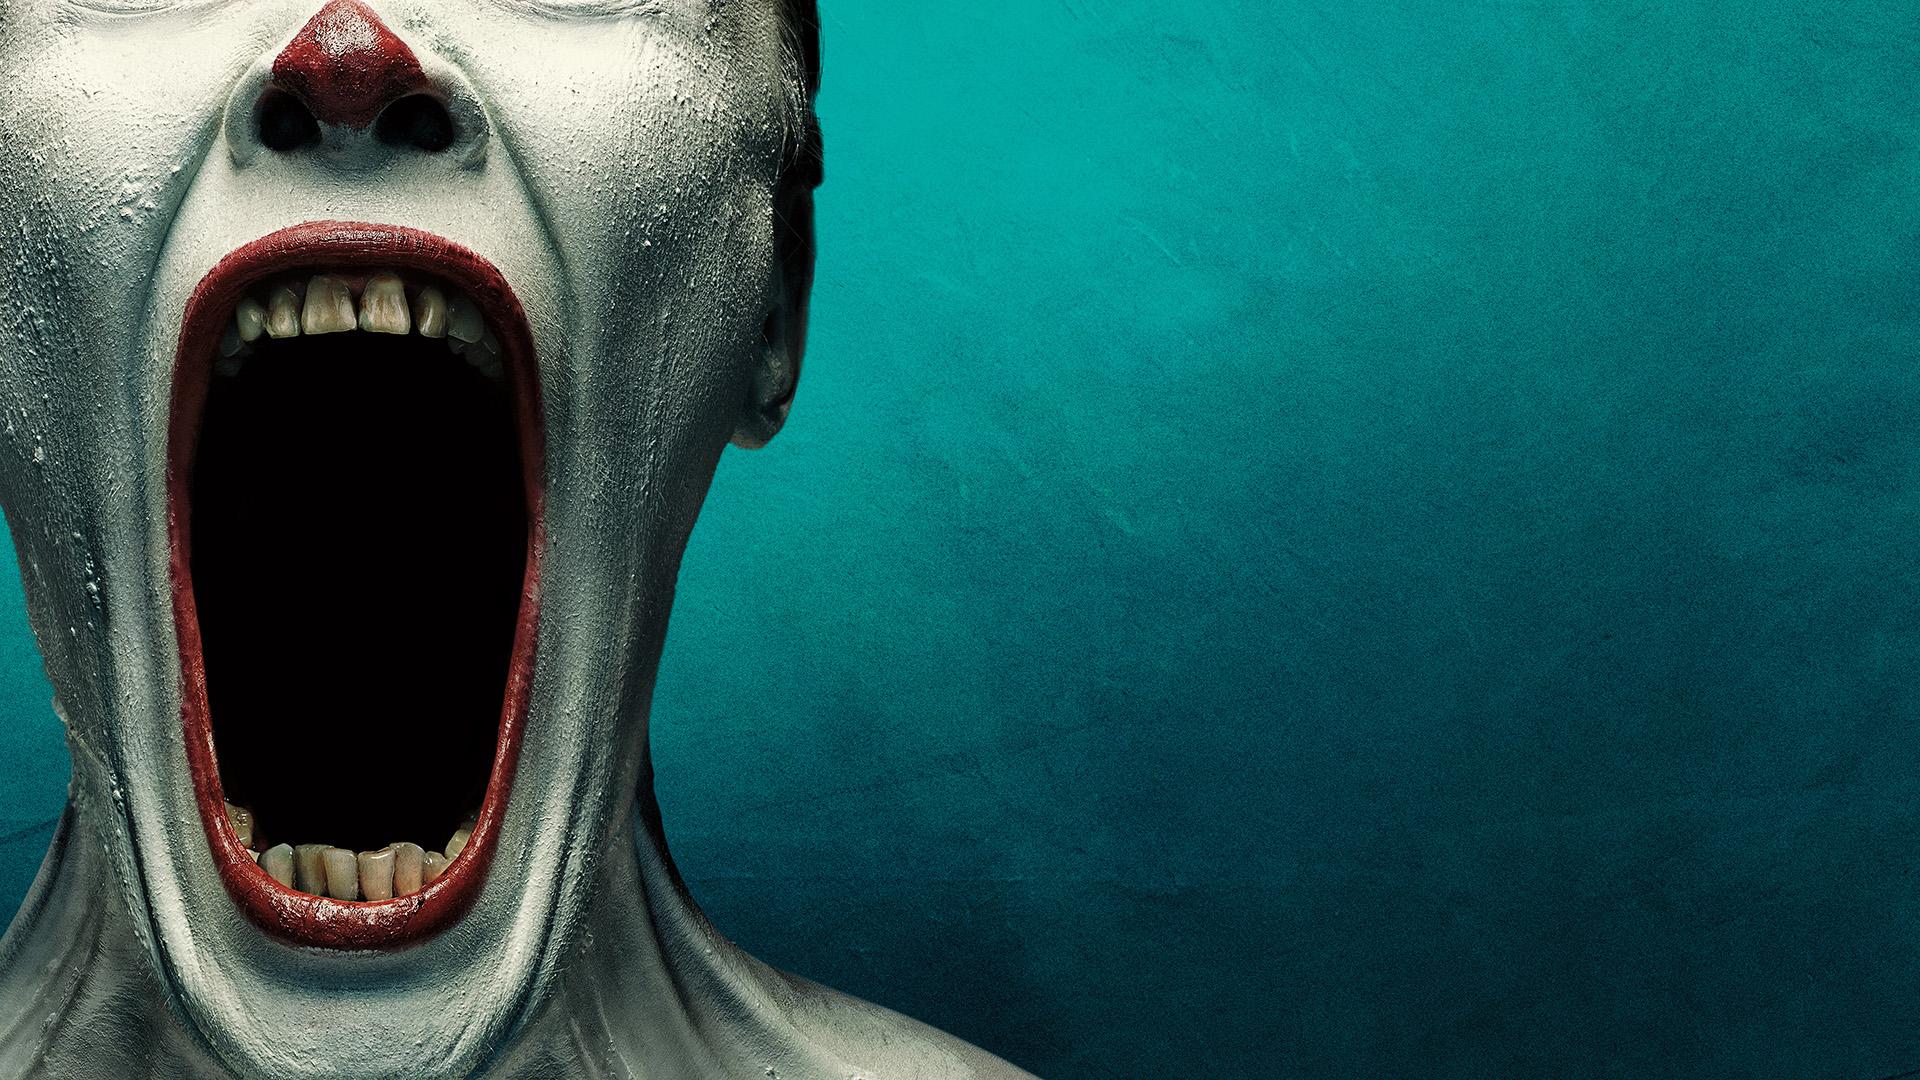 American Horror Story Freak Show Fondo De Pantalla Hd